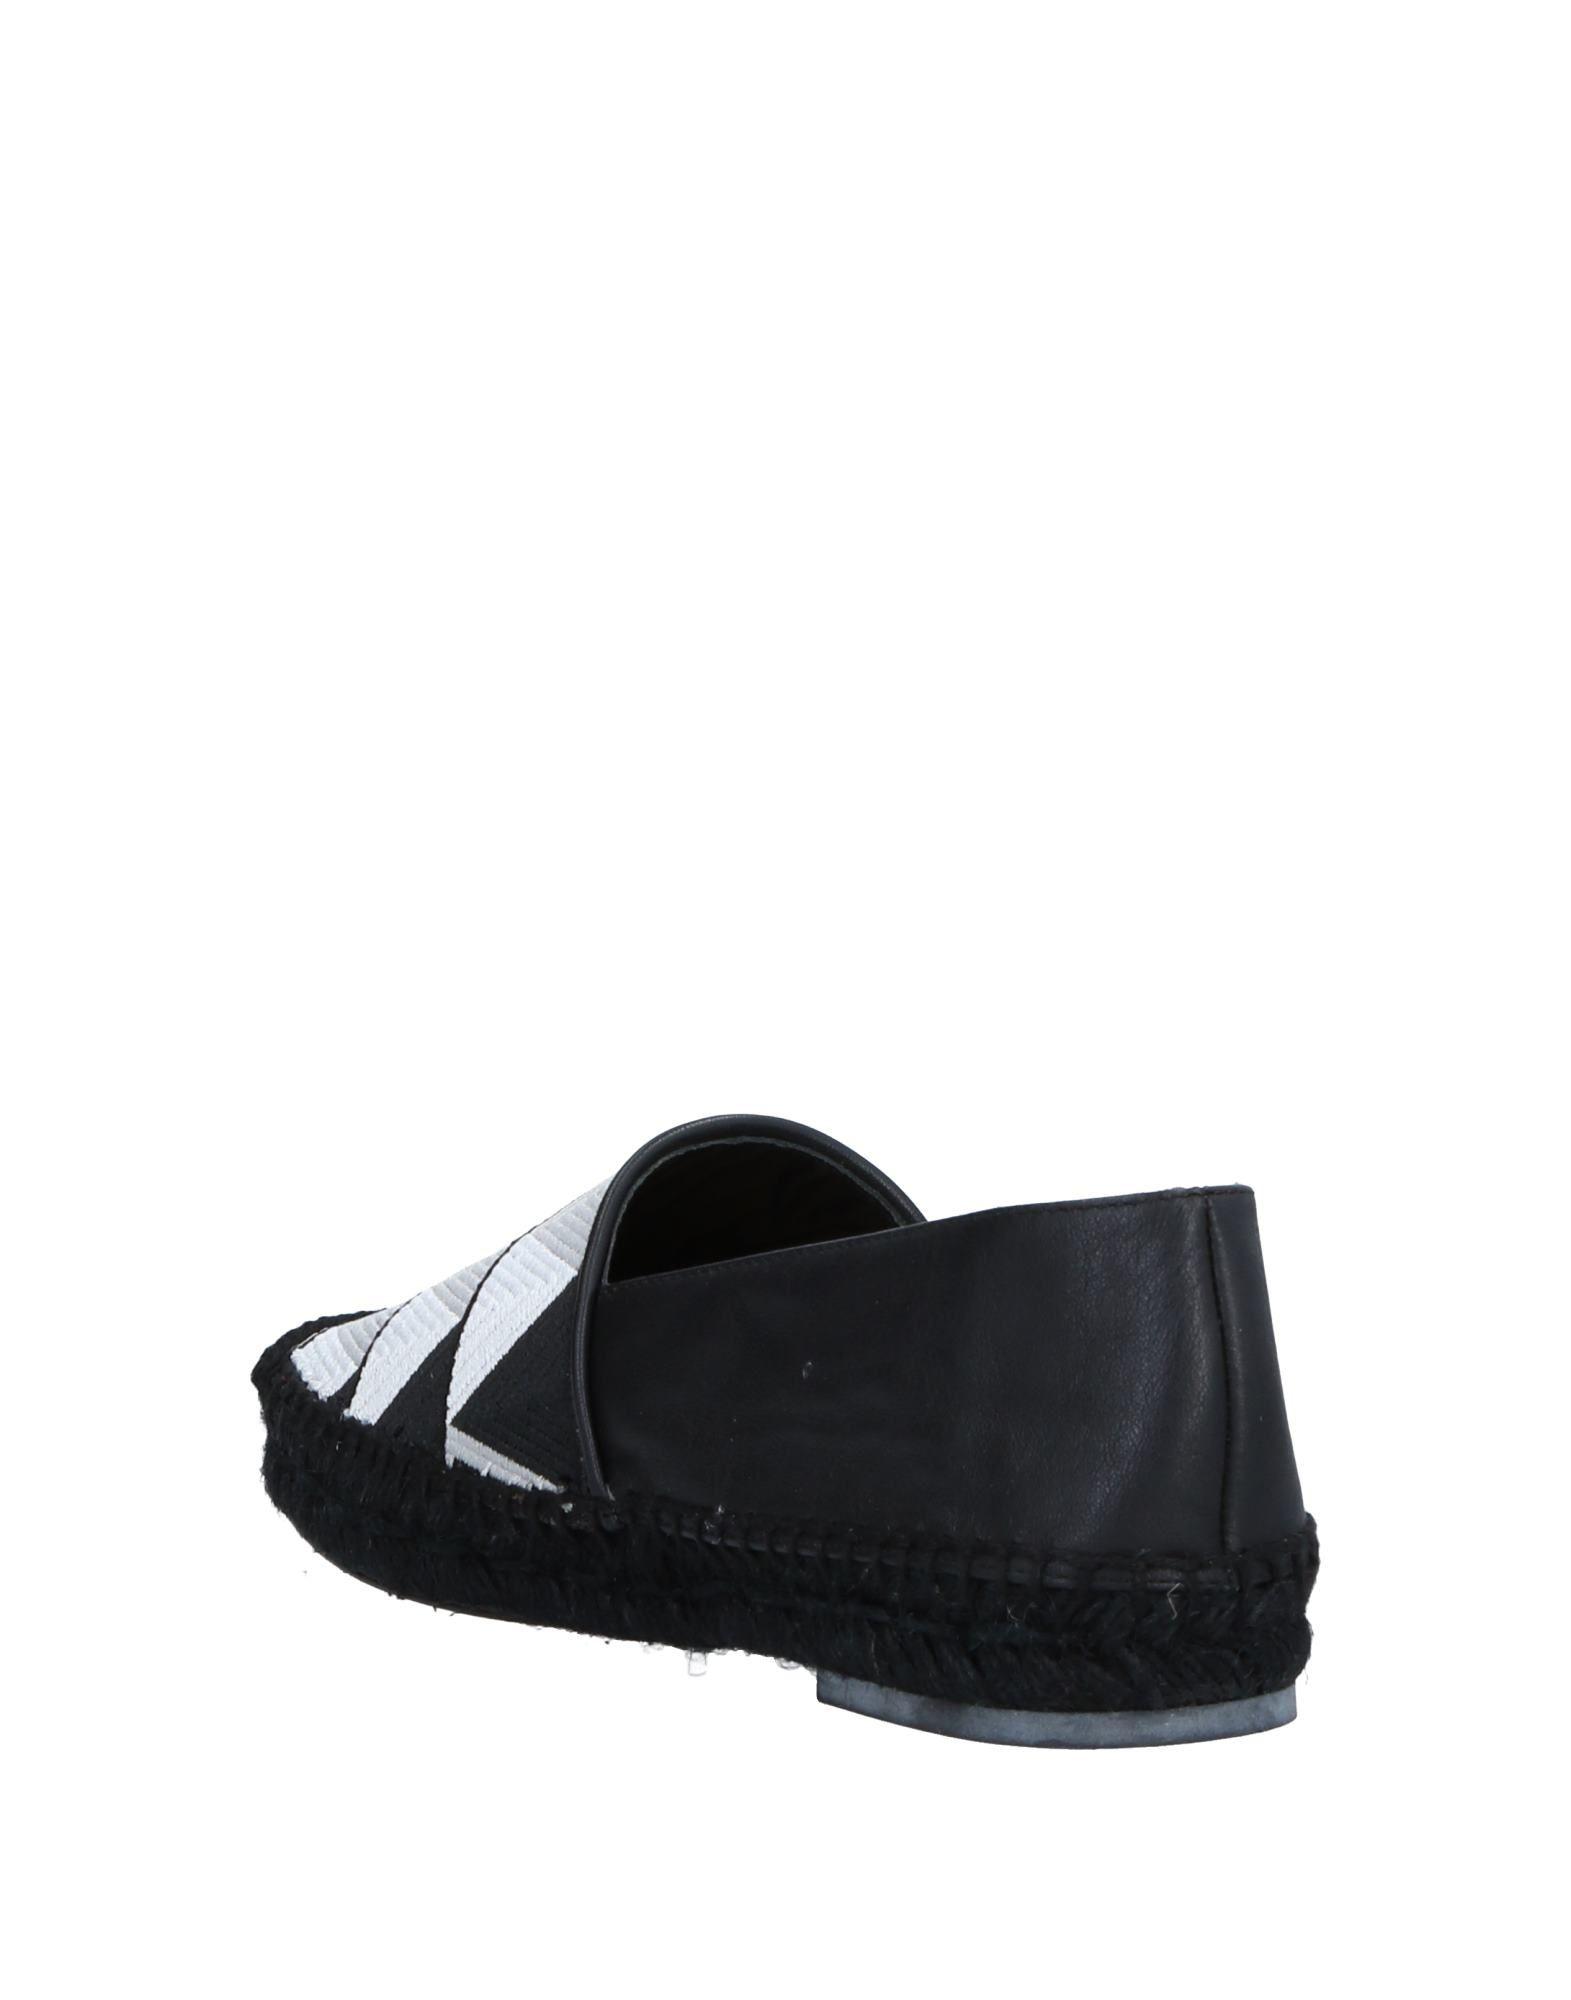 Gut um Espadrilles billige Schuhe zu tragenPaloma Barceló Espadrilles um Damen  11538256CM 248398